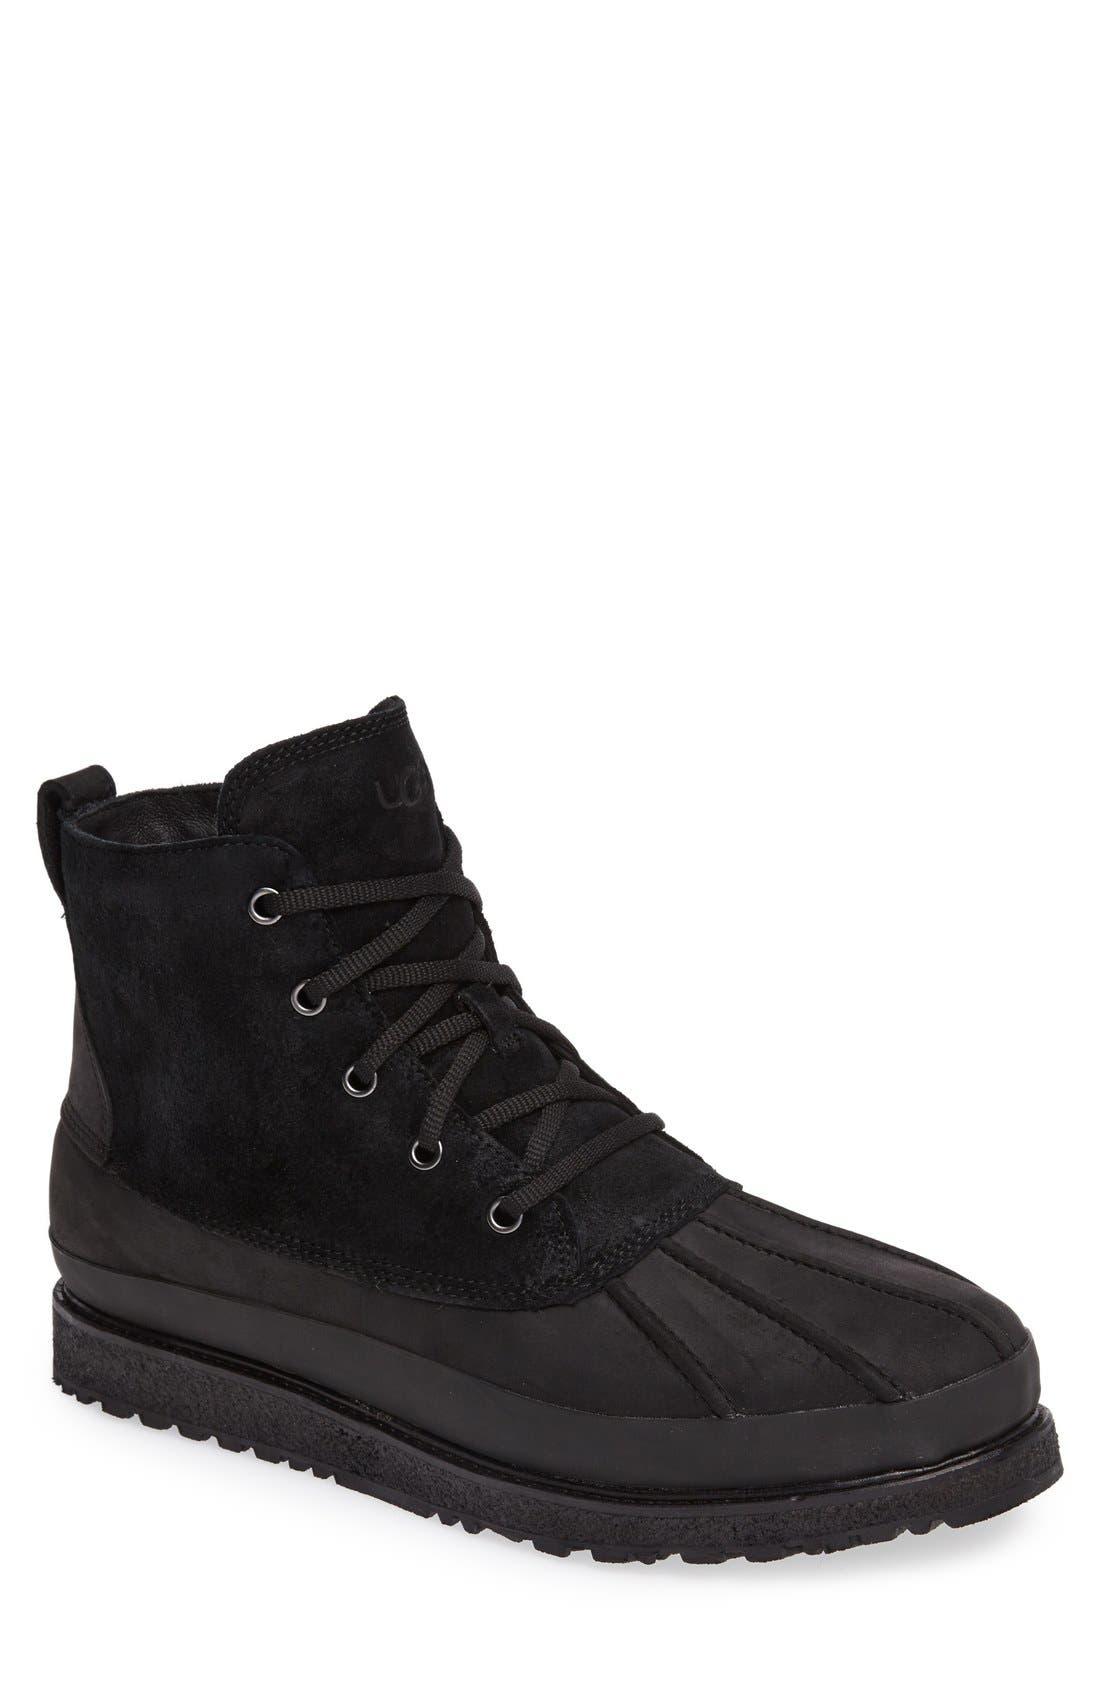 Fairbanks Waterproof Boot,                             Main thumbnail 1, color,                             Black